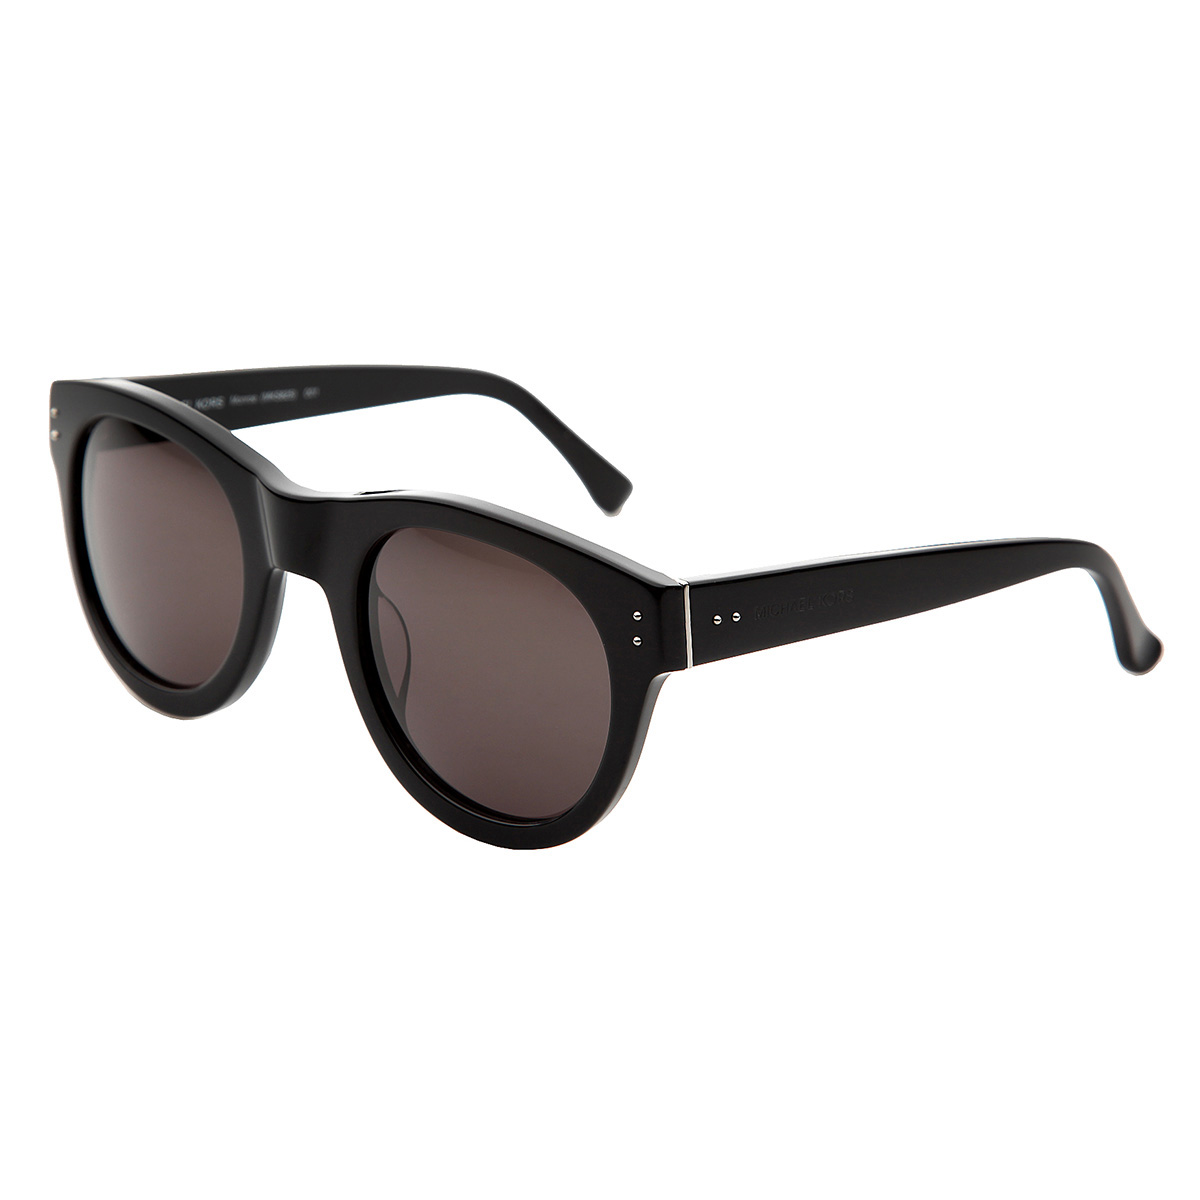 michael kors sonnenbrille mks825 001 unisex monroe sunglasses schwarz neu ovp. Black Bedroom Furniture Sets. Home Design Ideas